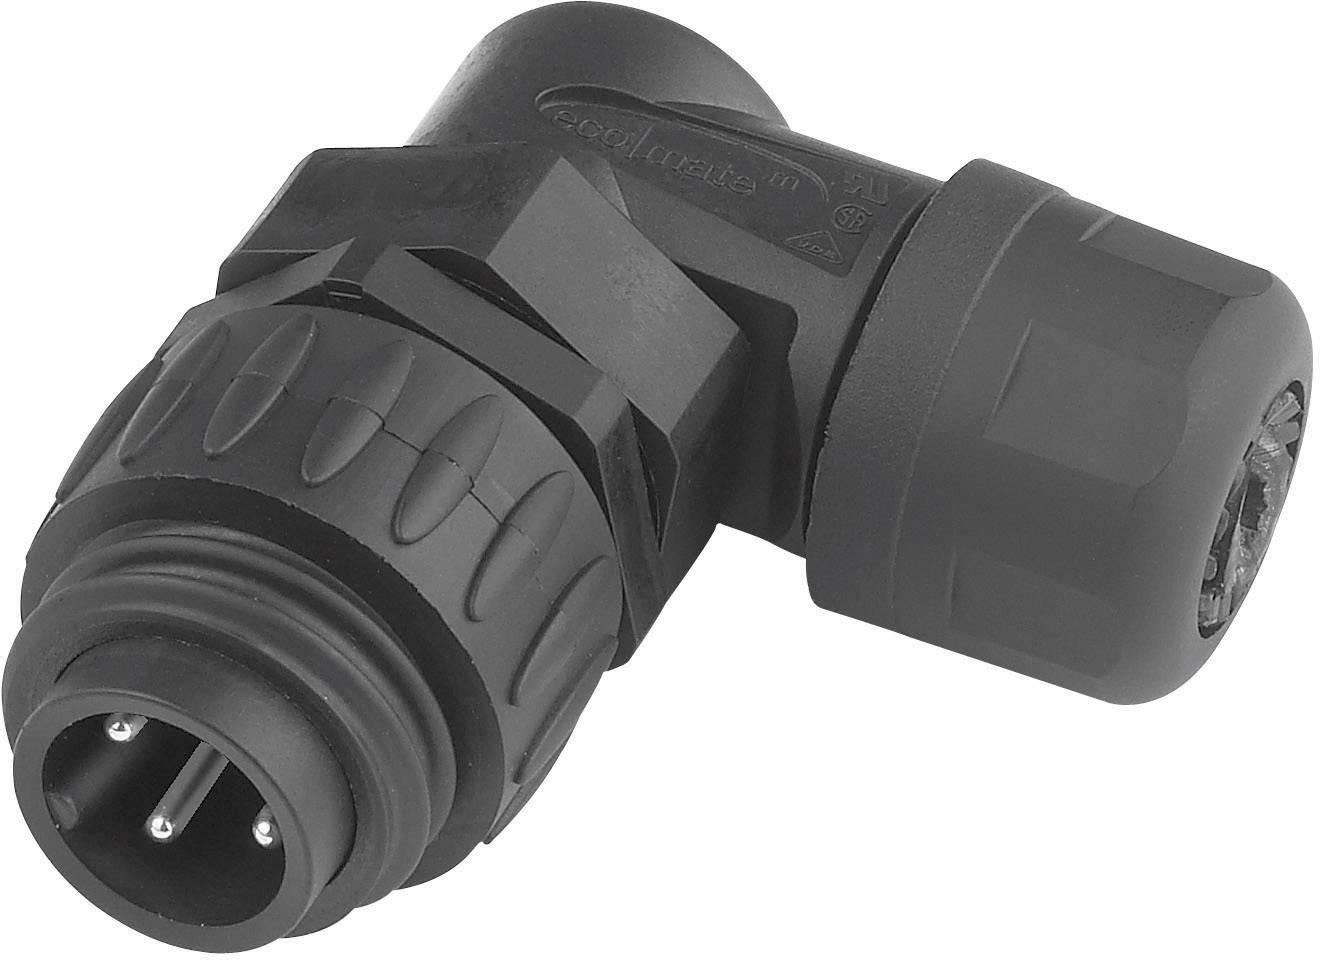 Kabelový konektor 3+PE Amphenol C016 20K003 100 12, černá, úhlový